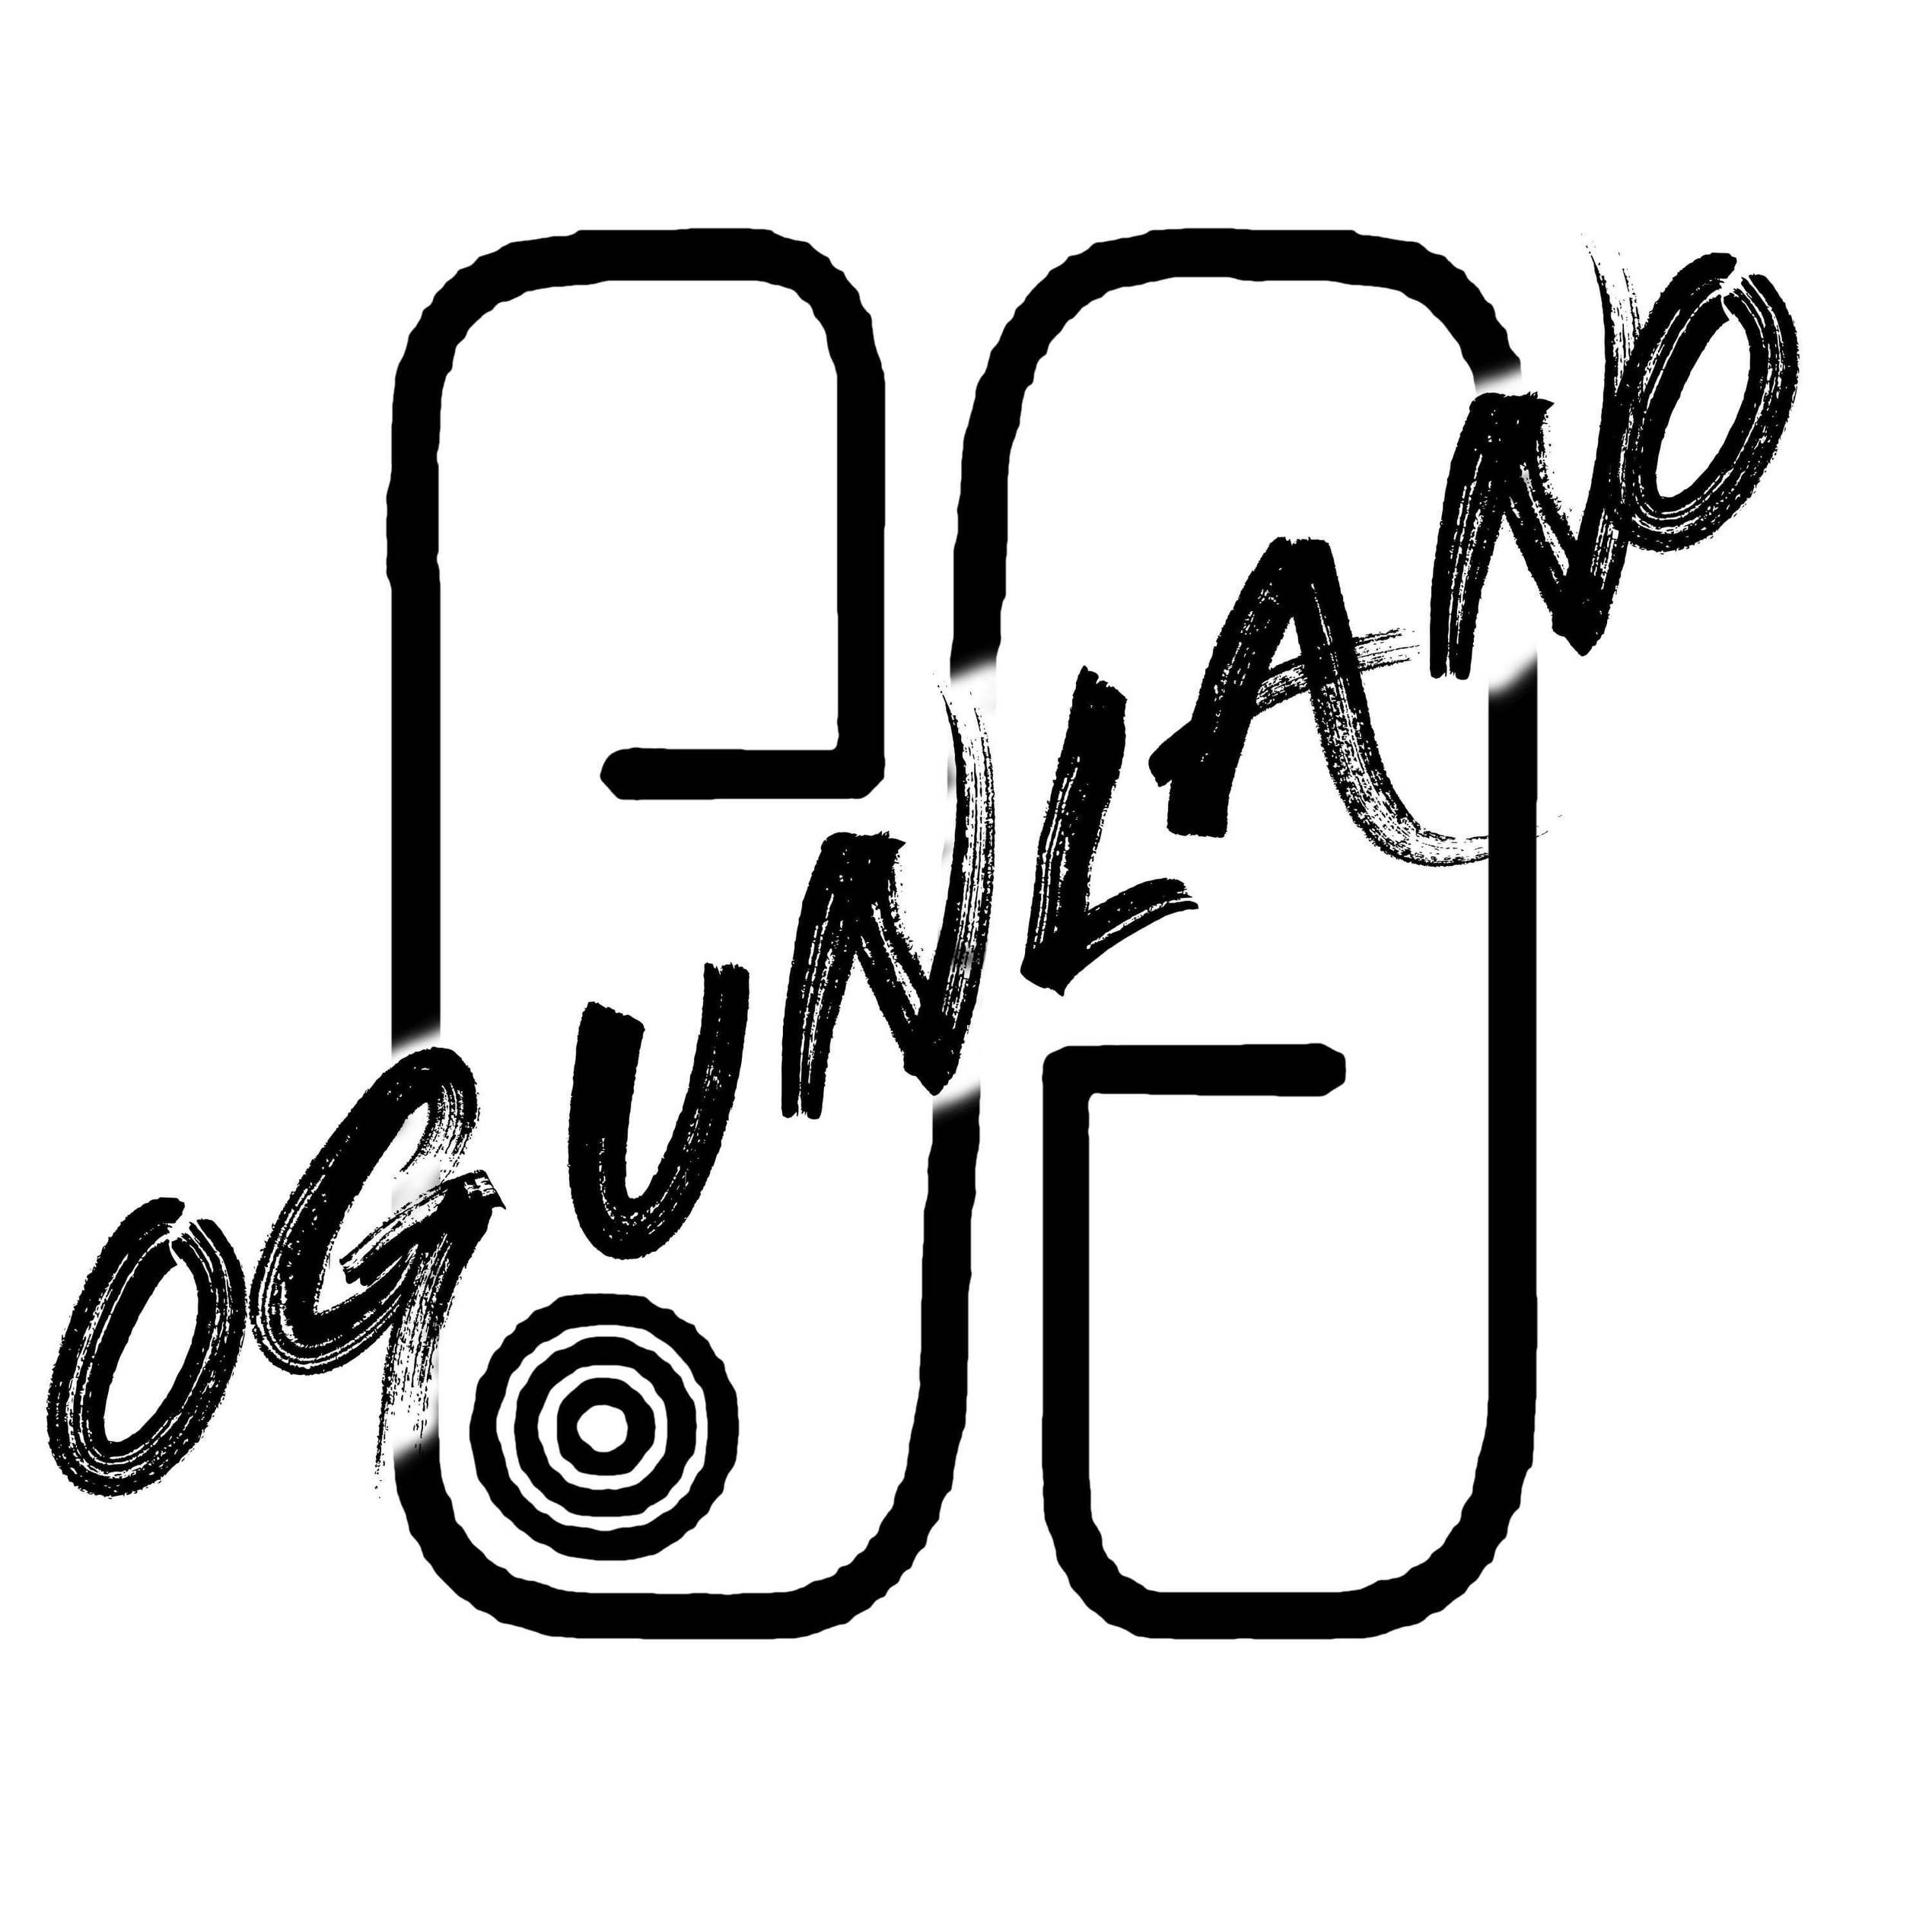 Ogunlano